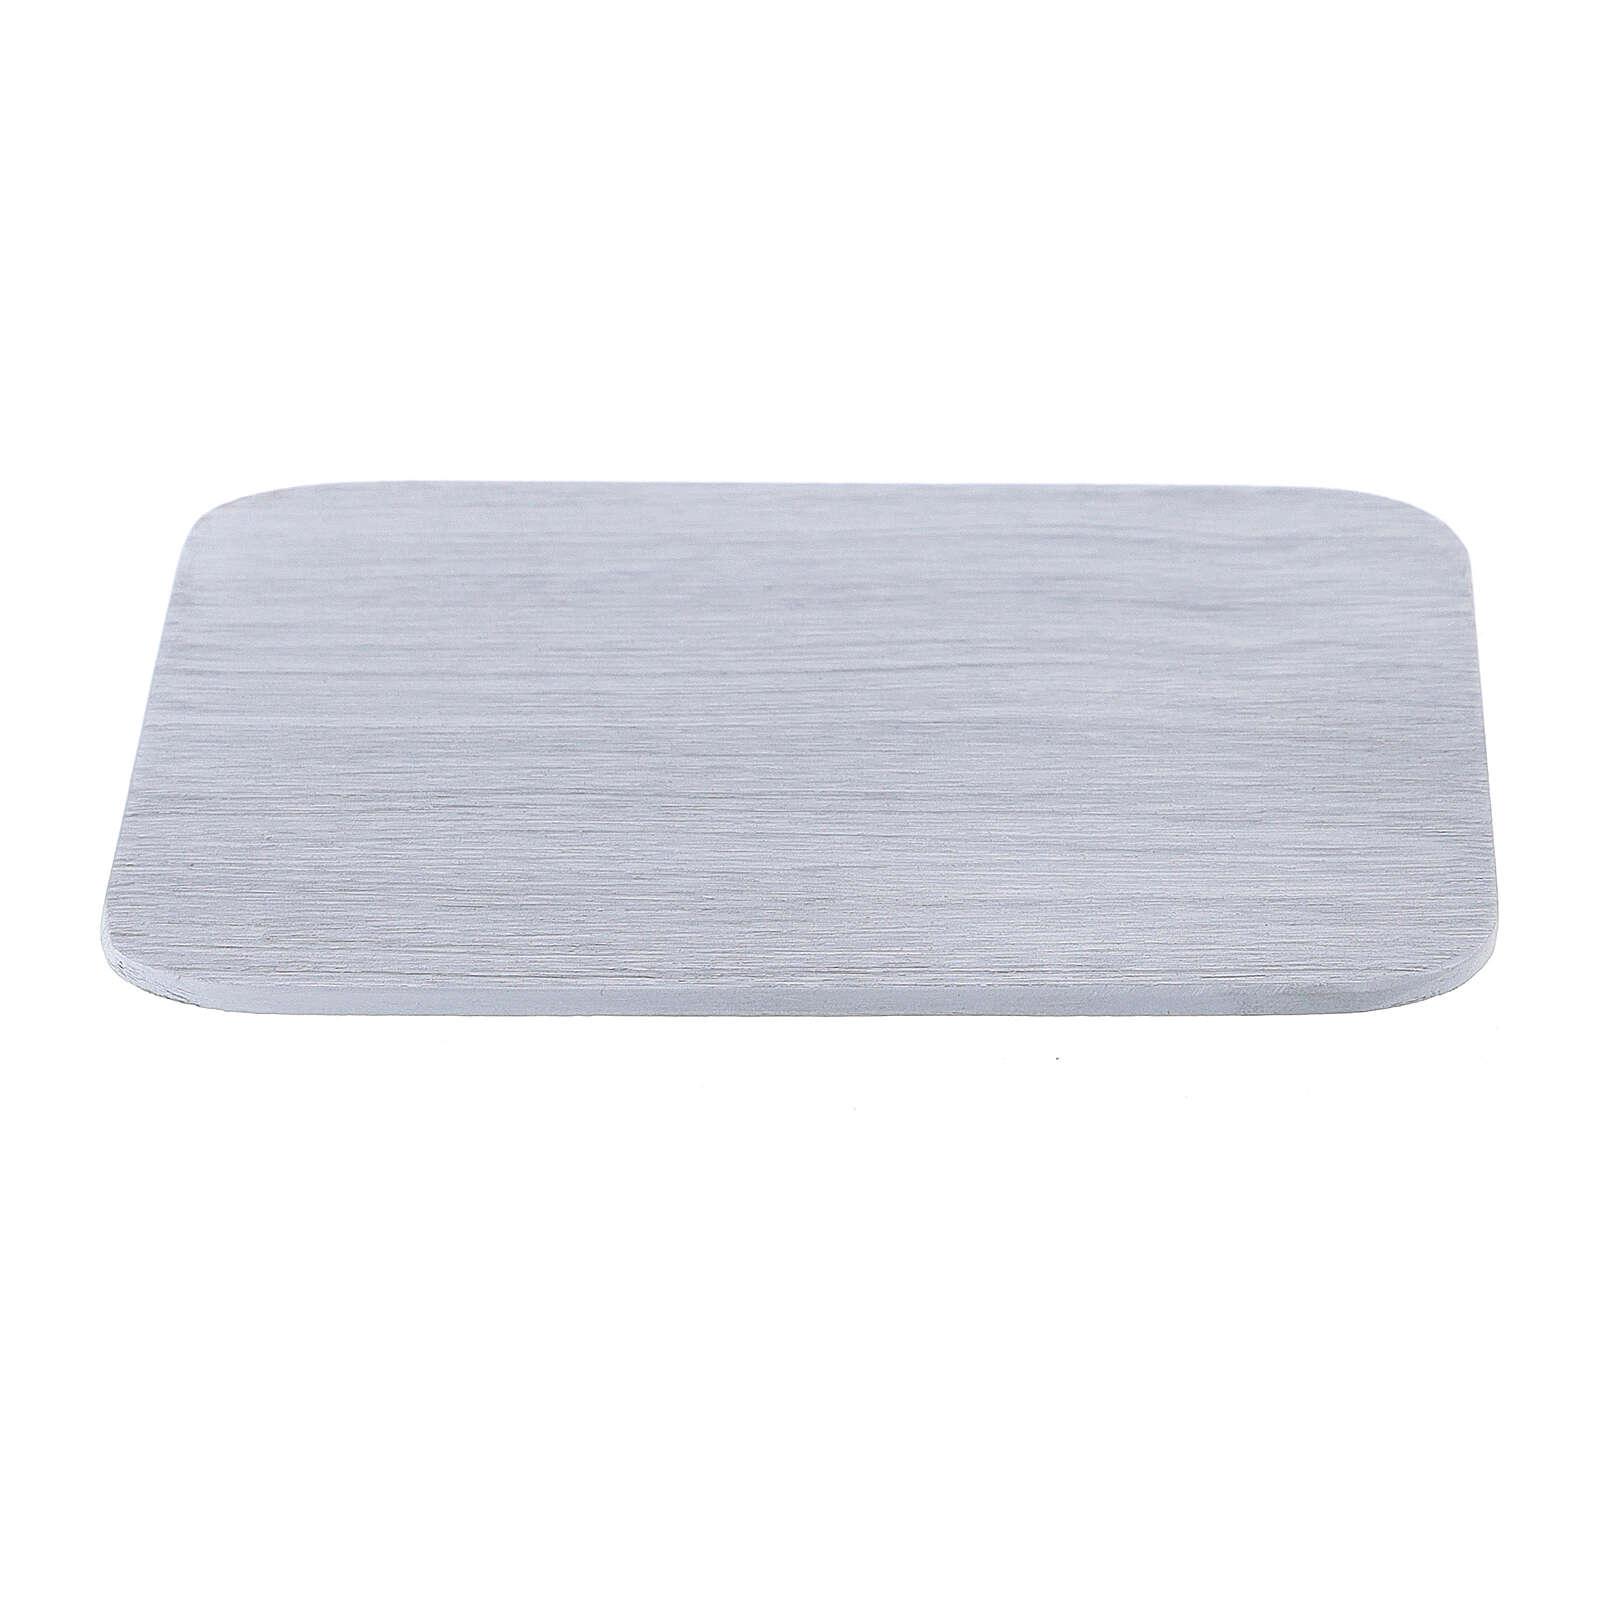 Plato cuadrado aluminio blanco cepillado 10x10 cm 3